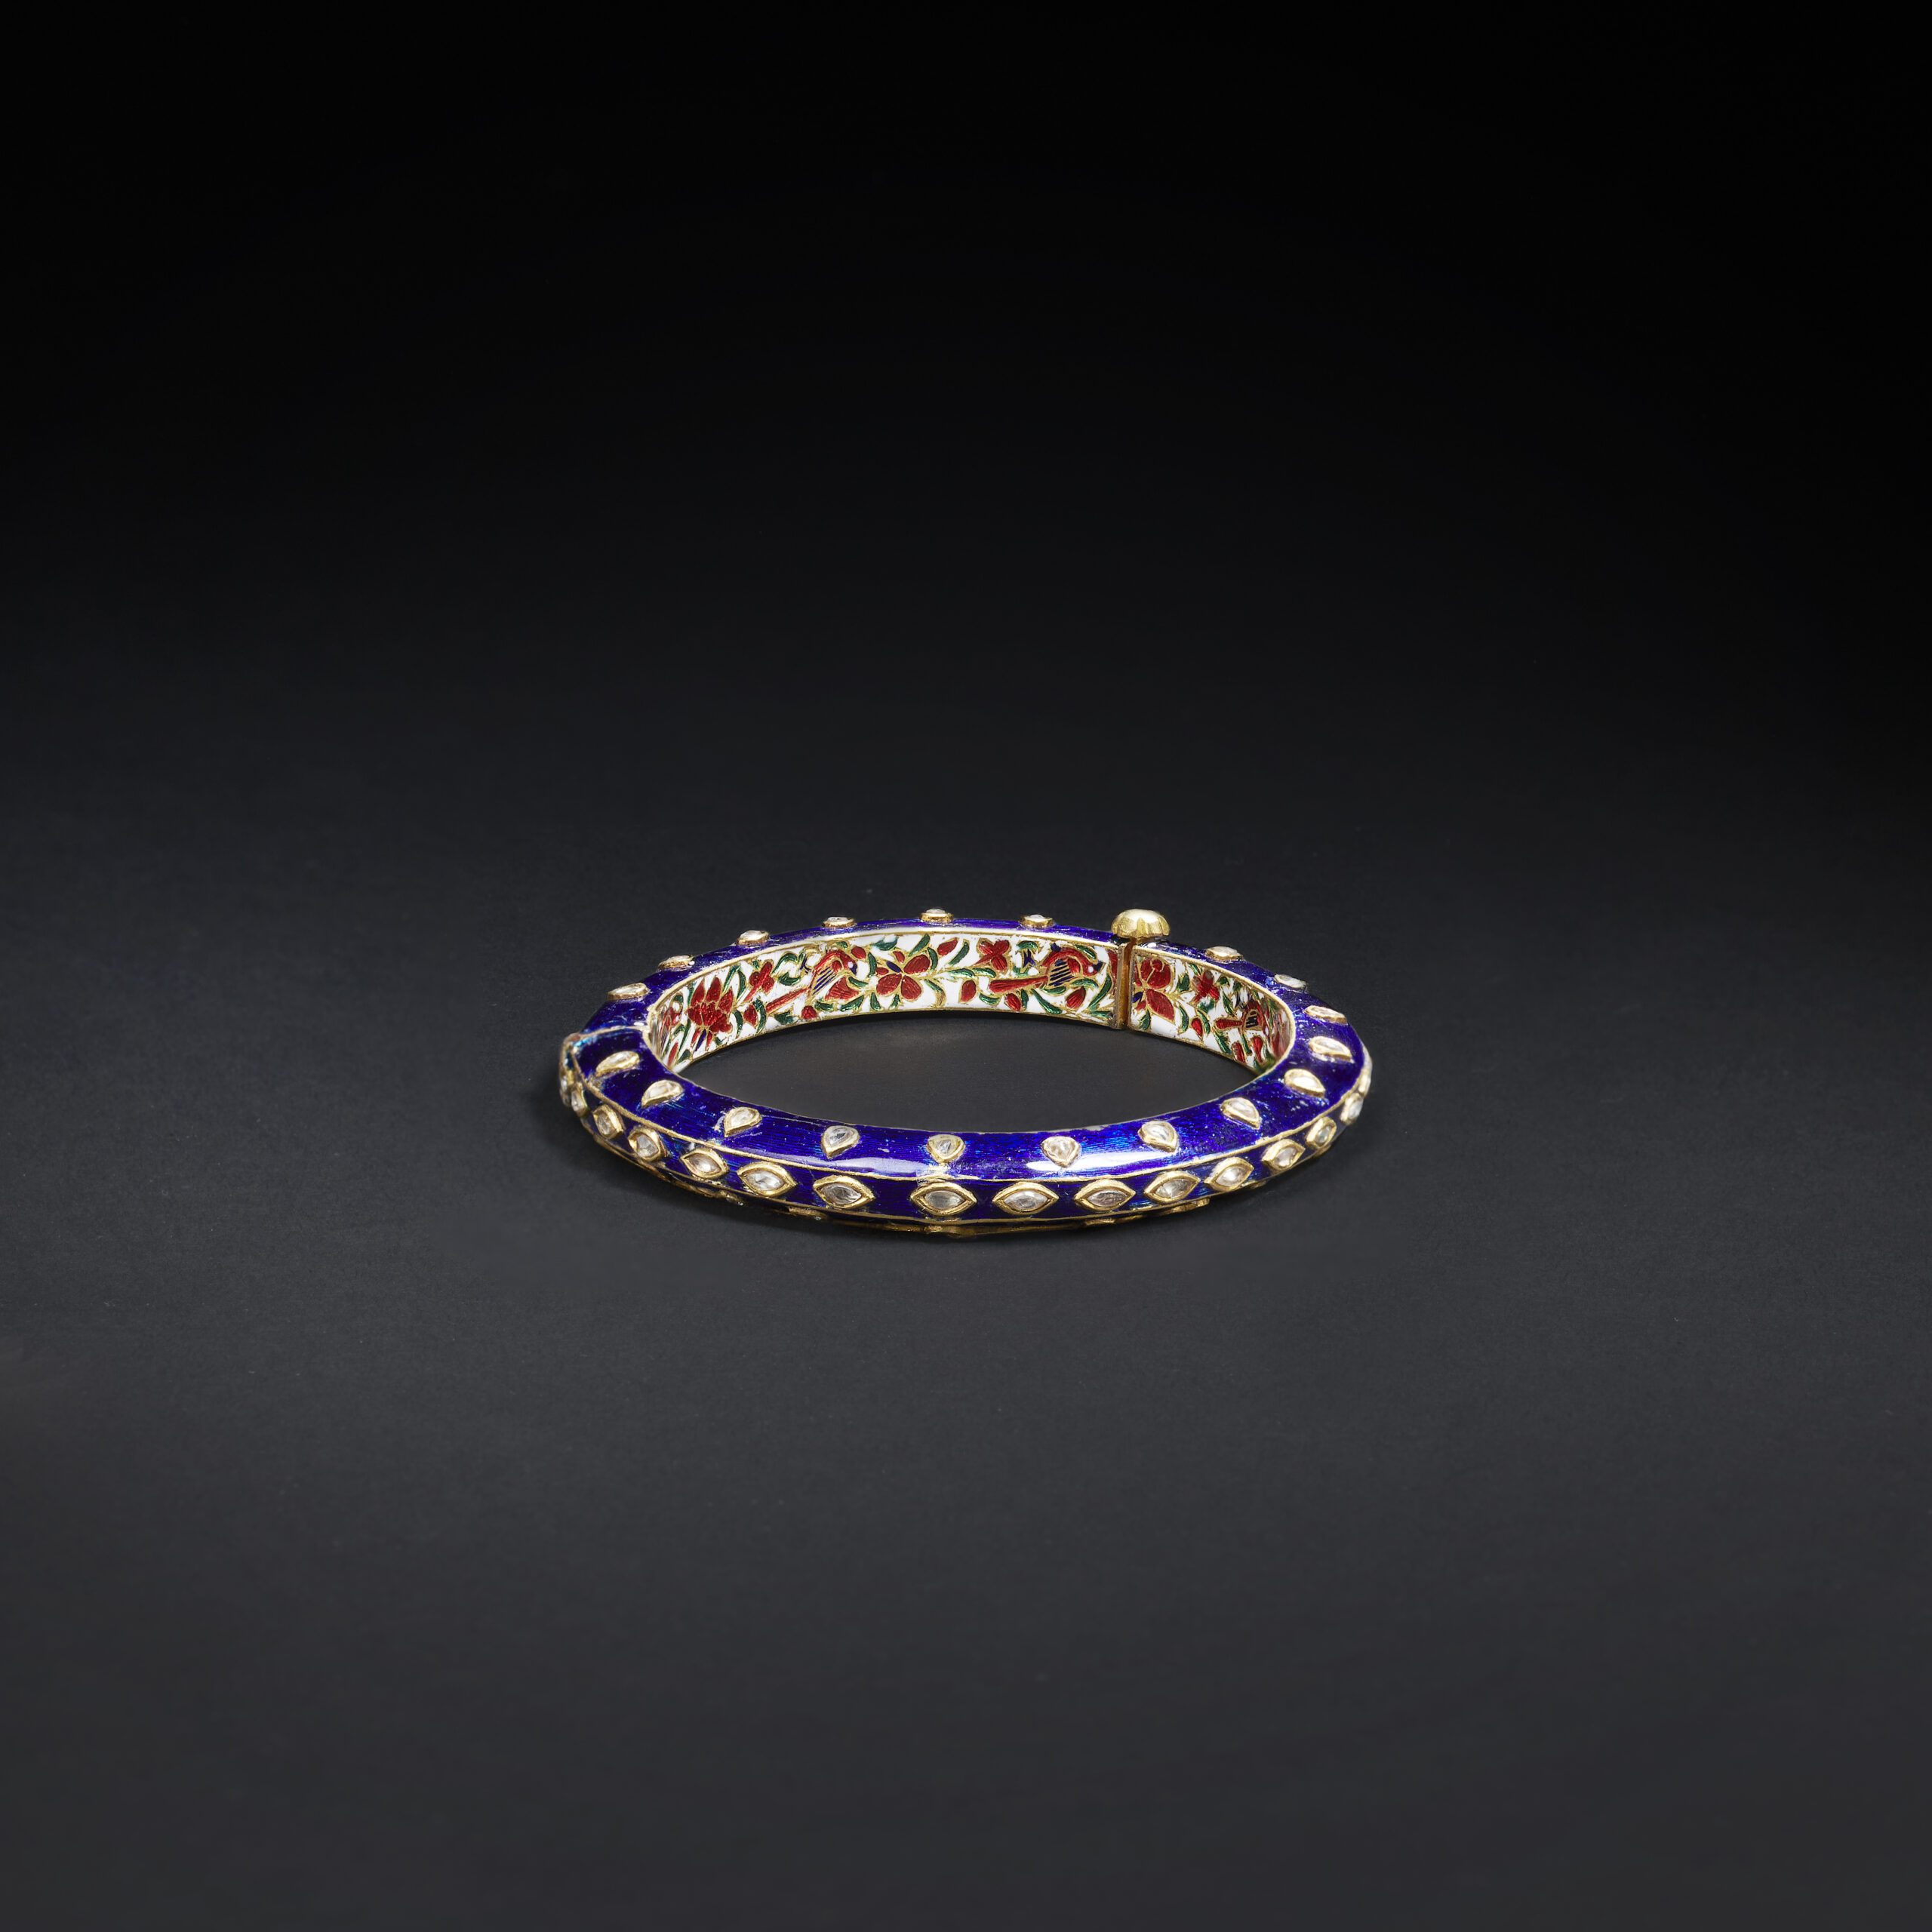 A BLUE ENAMEL AND DIAMOND BRACELET, JAIPUR, 19th Century